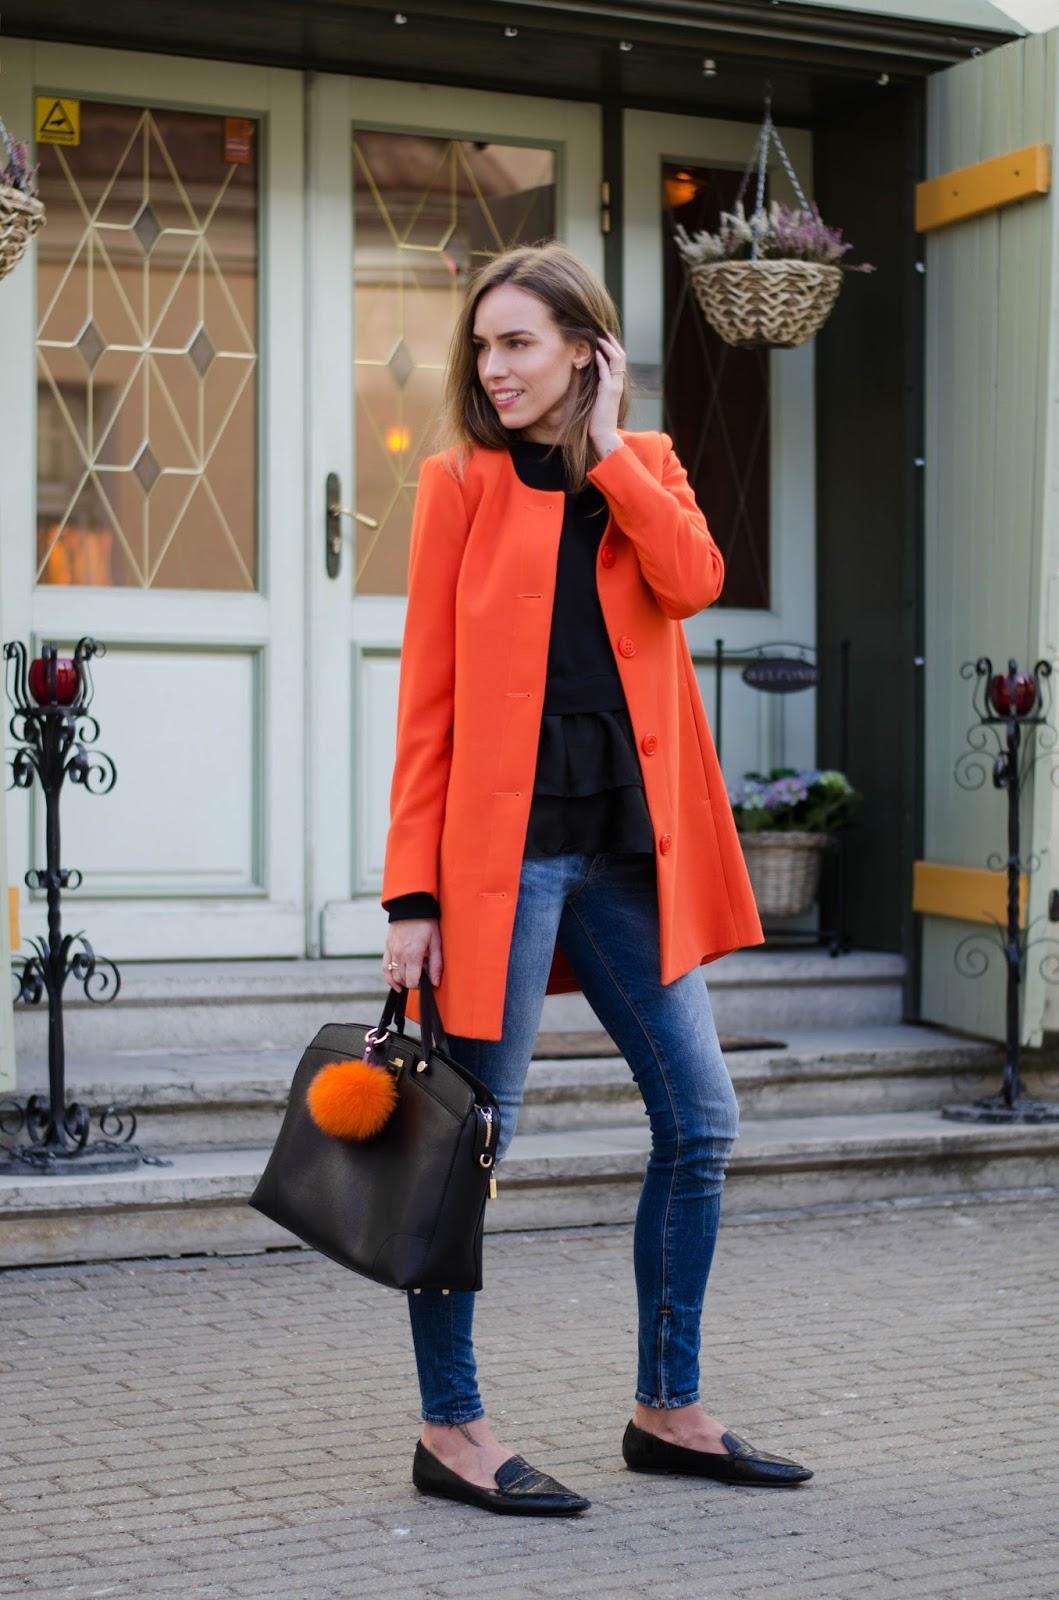 kristjaana mere spring outfit orange coat